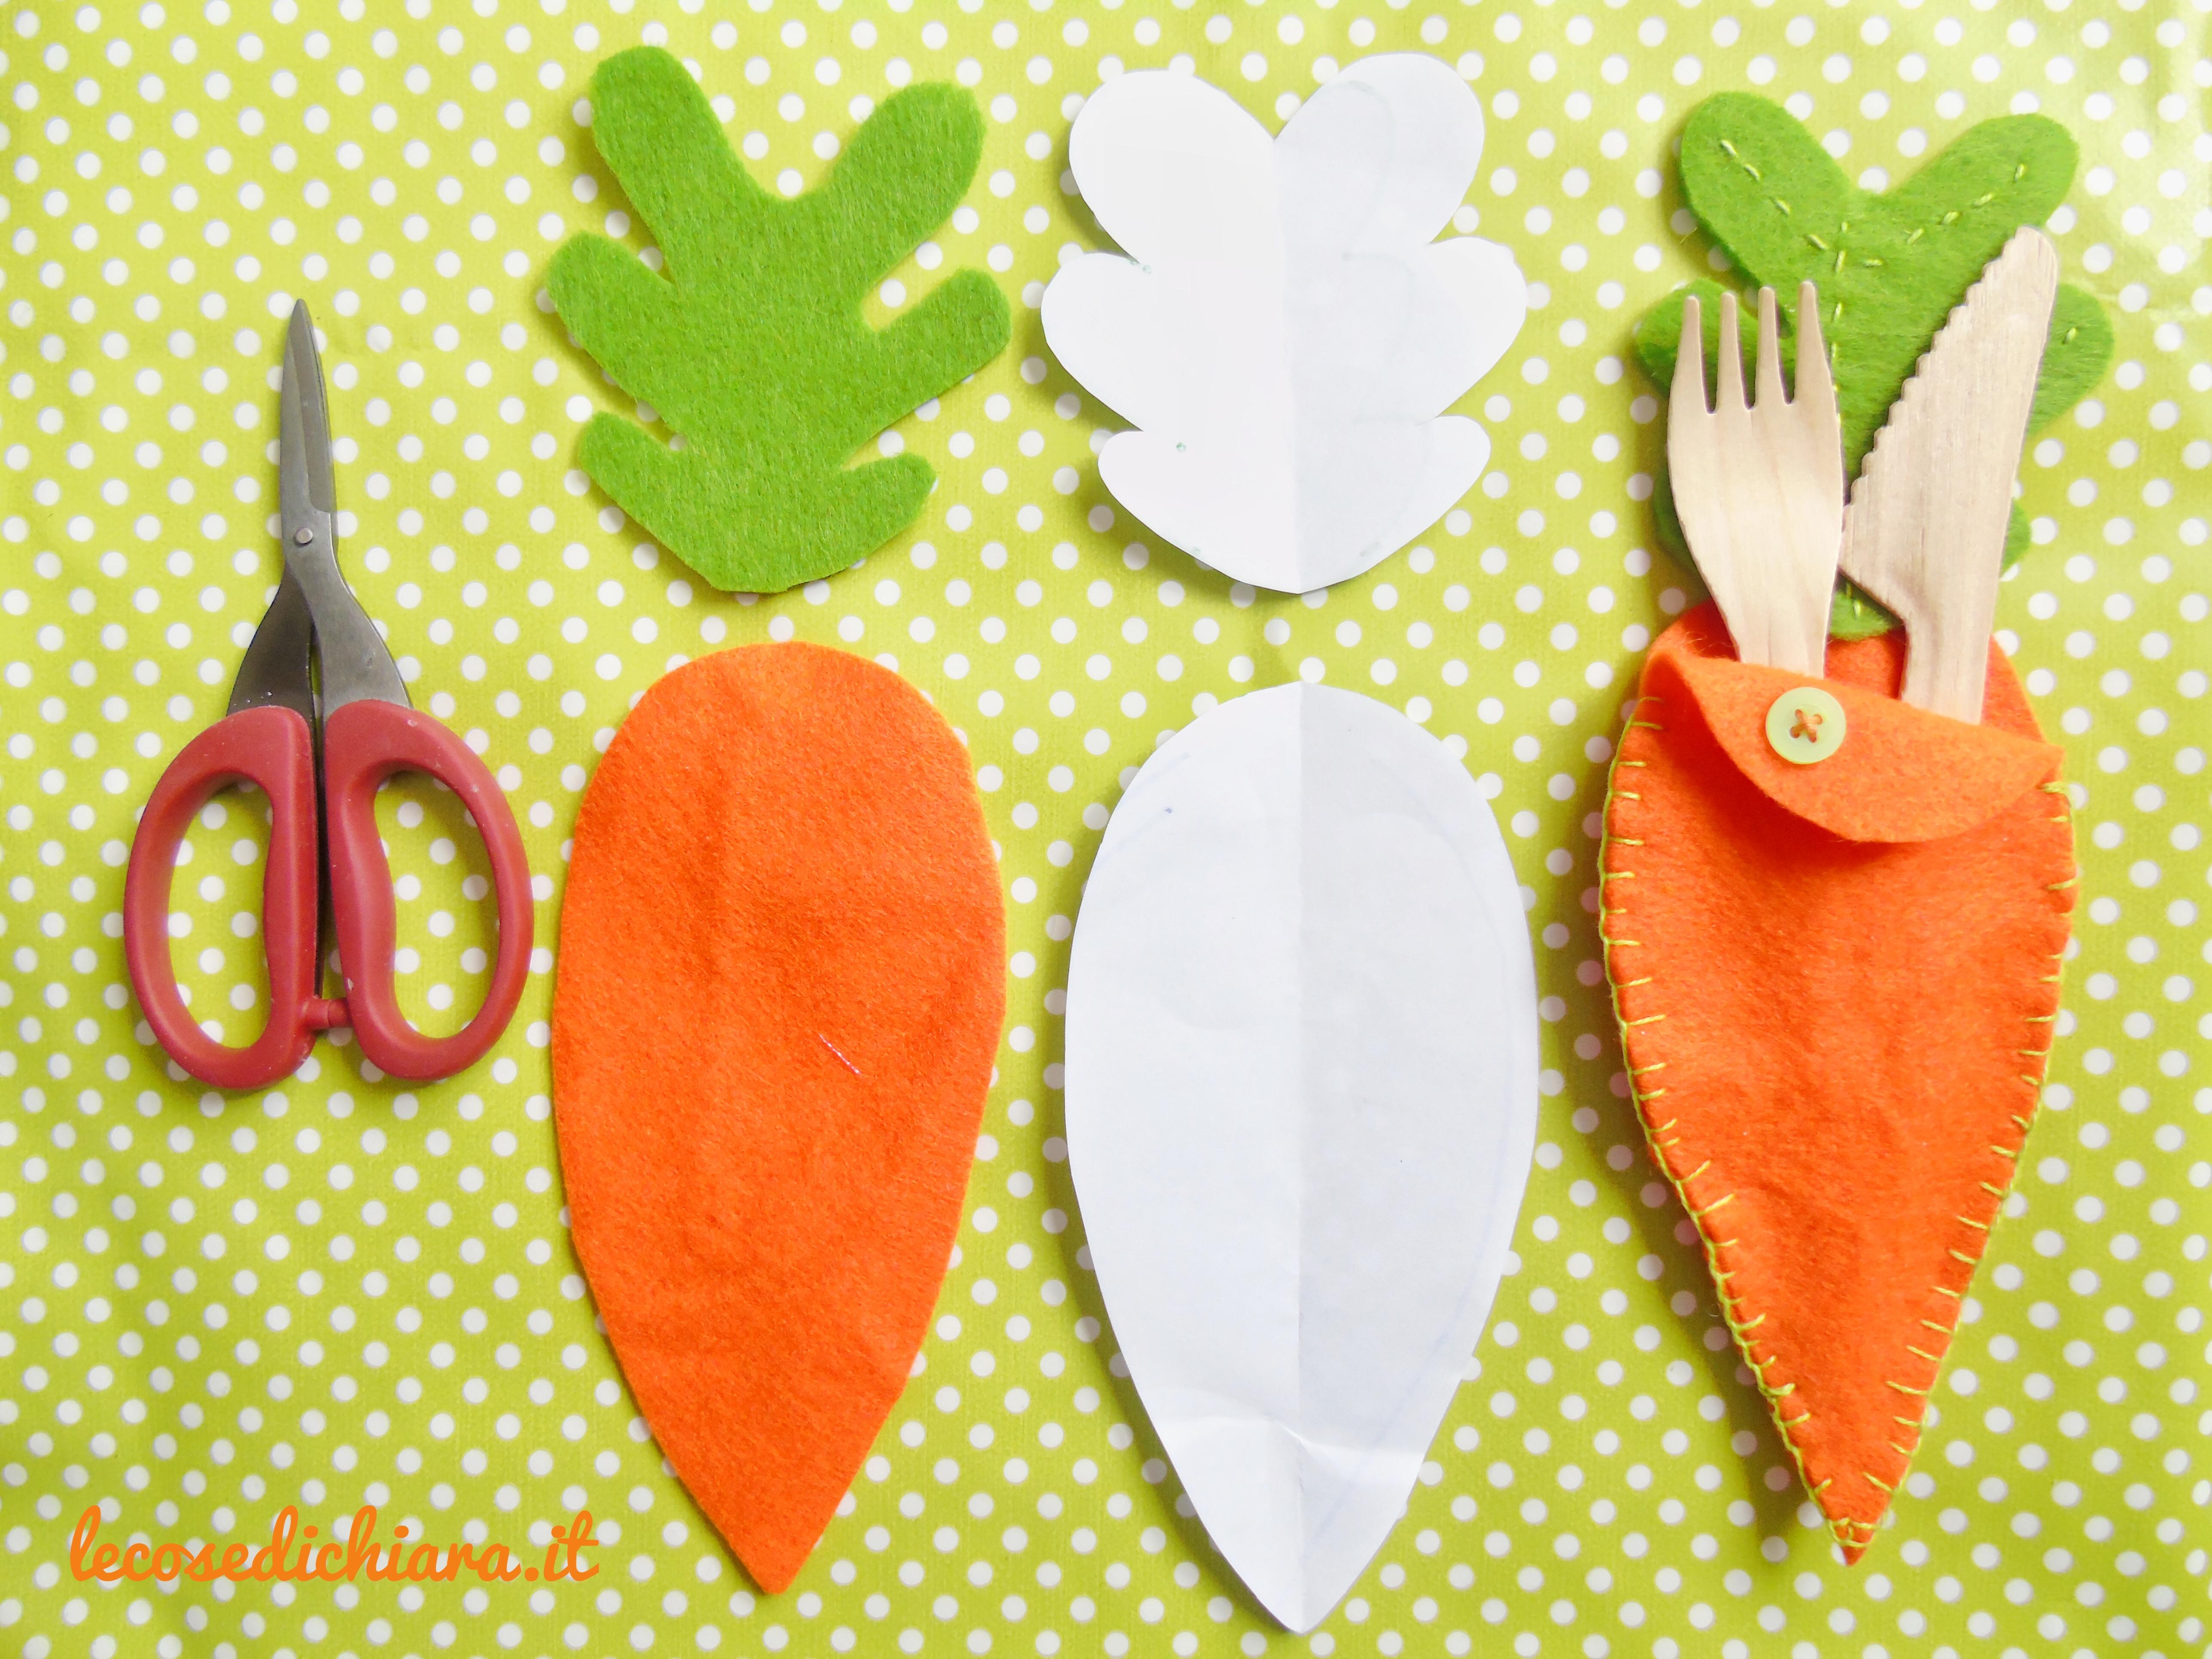 step-1-carote-per-pasqua-lecosedichiara-chiara-zenga